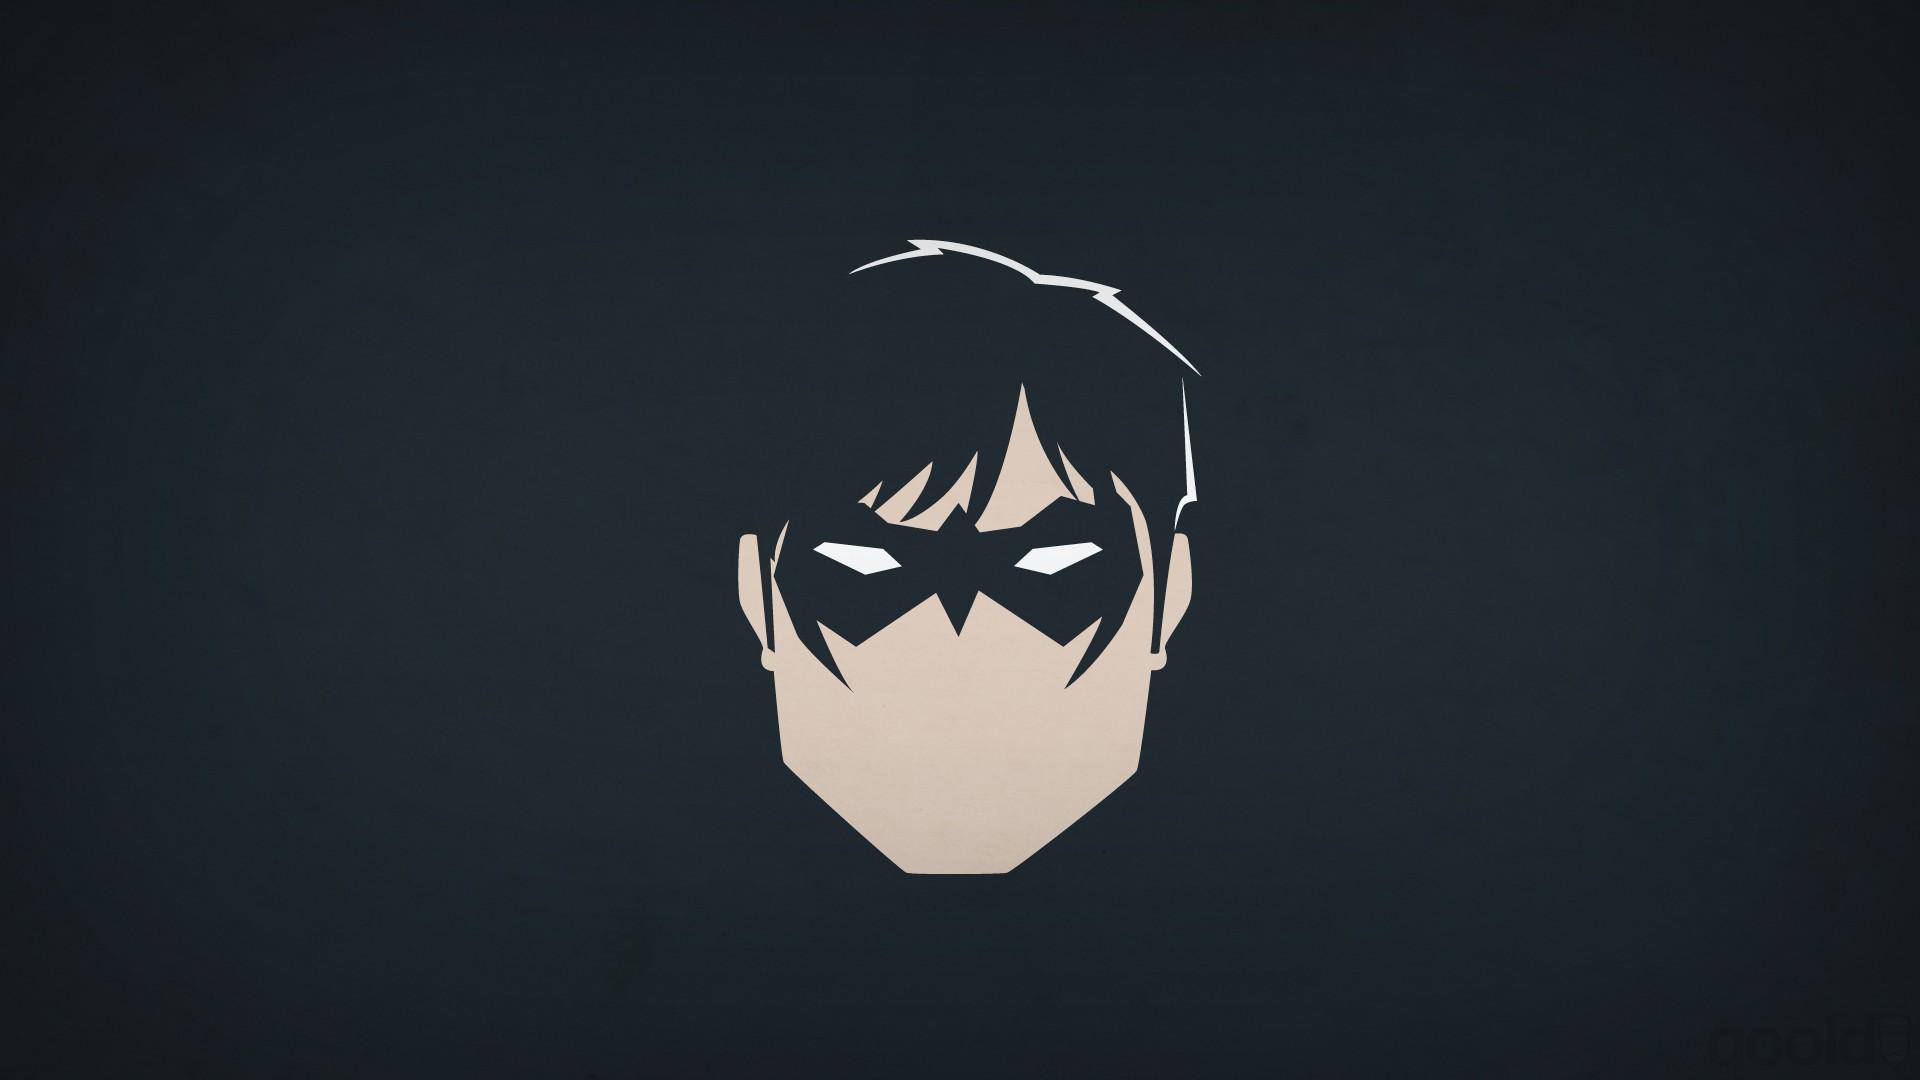 1920x1080 Px Blo0p DC Comics Heroes Minimalism Nightwing Superhero